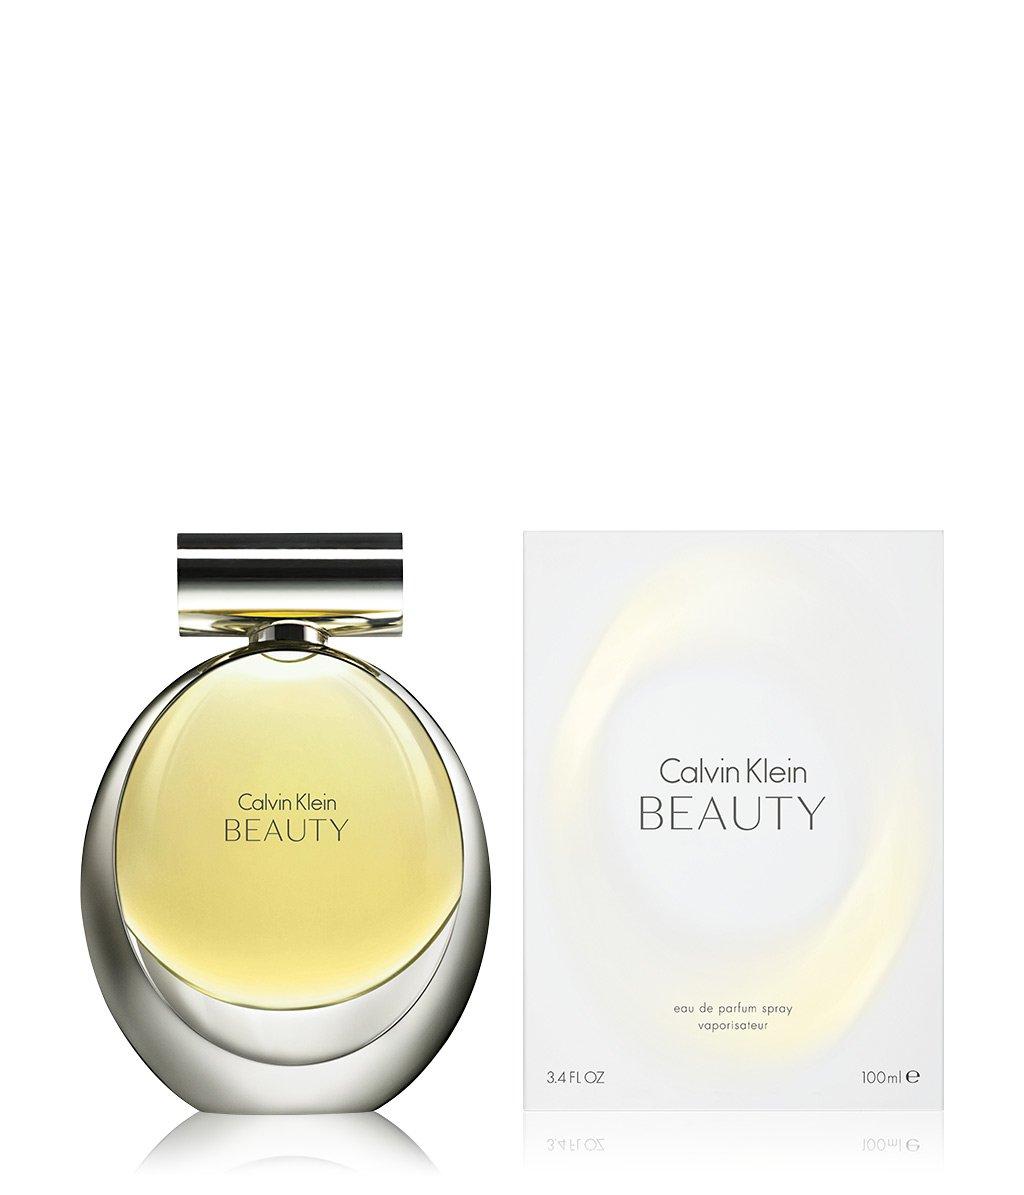 calvin klein beauty parfum online bestellen flaconi. Black Bedroom Furniture Sets. Home Design Ideas